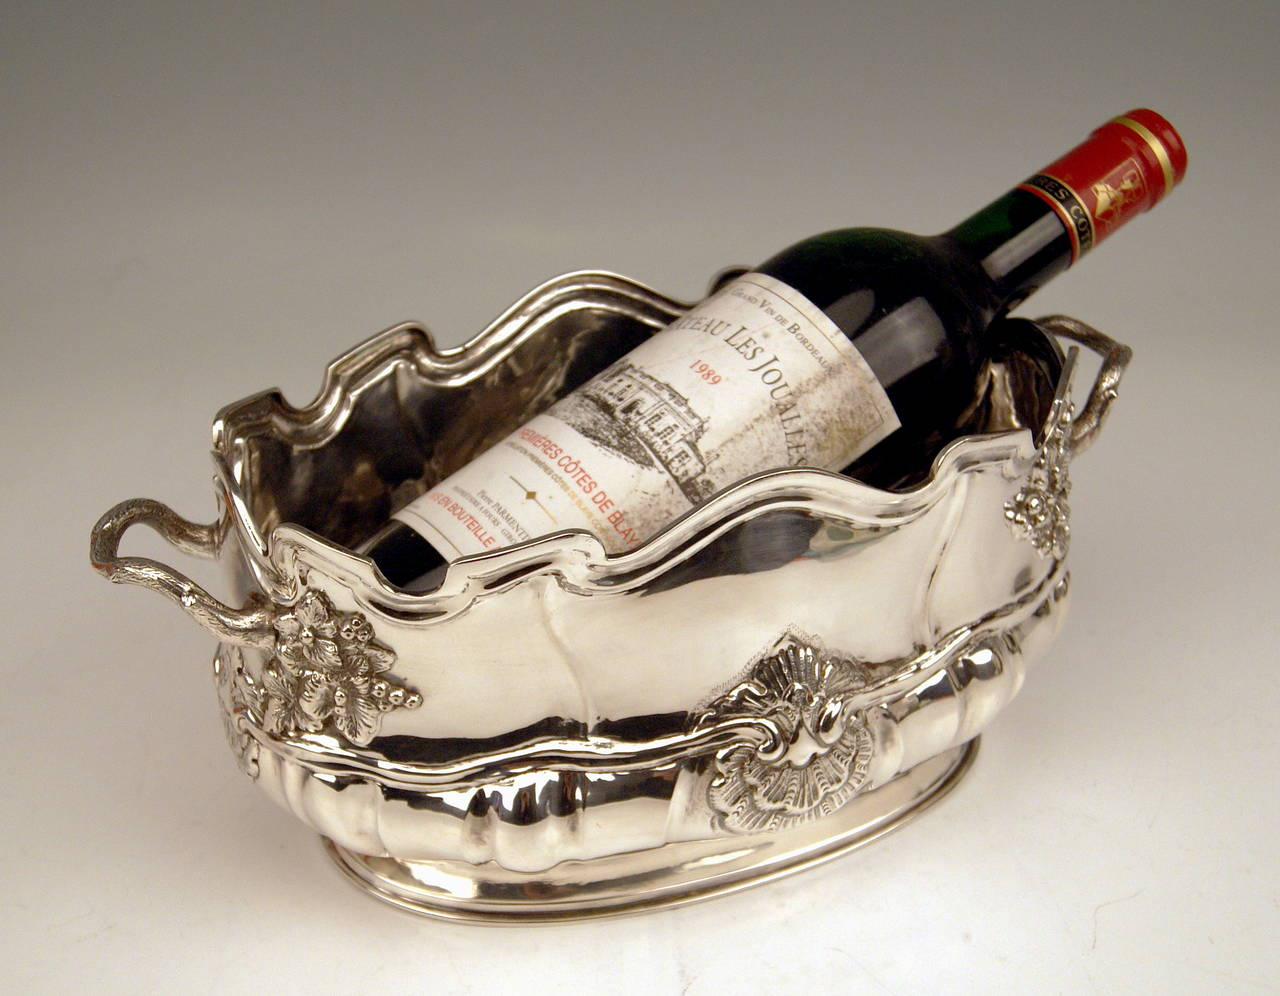 Art Nouveau Silver Swiss Wine Cooler Bottle Holder made in Geneva, Switzerland, circa 1900 For Sale